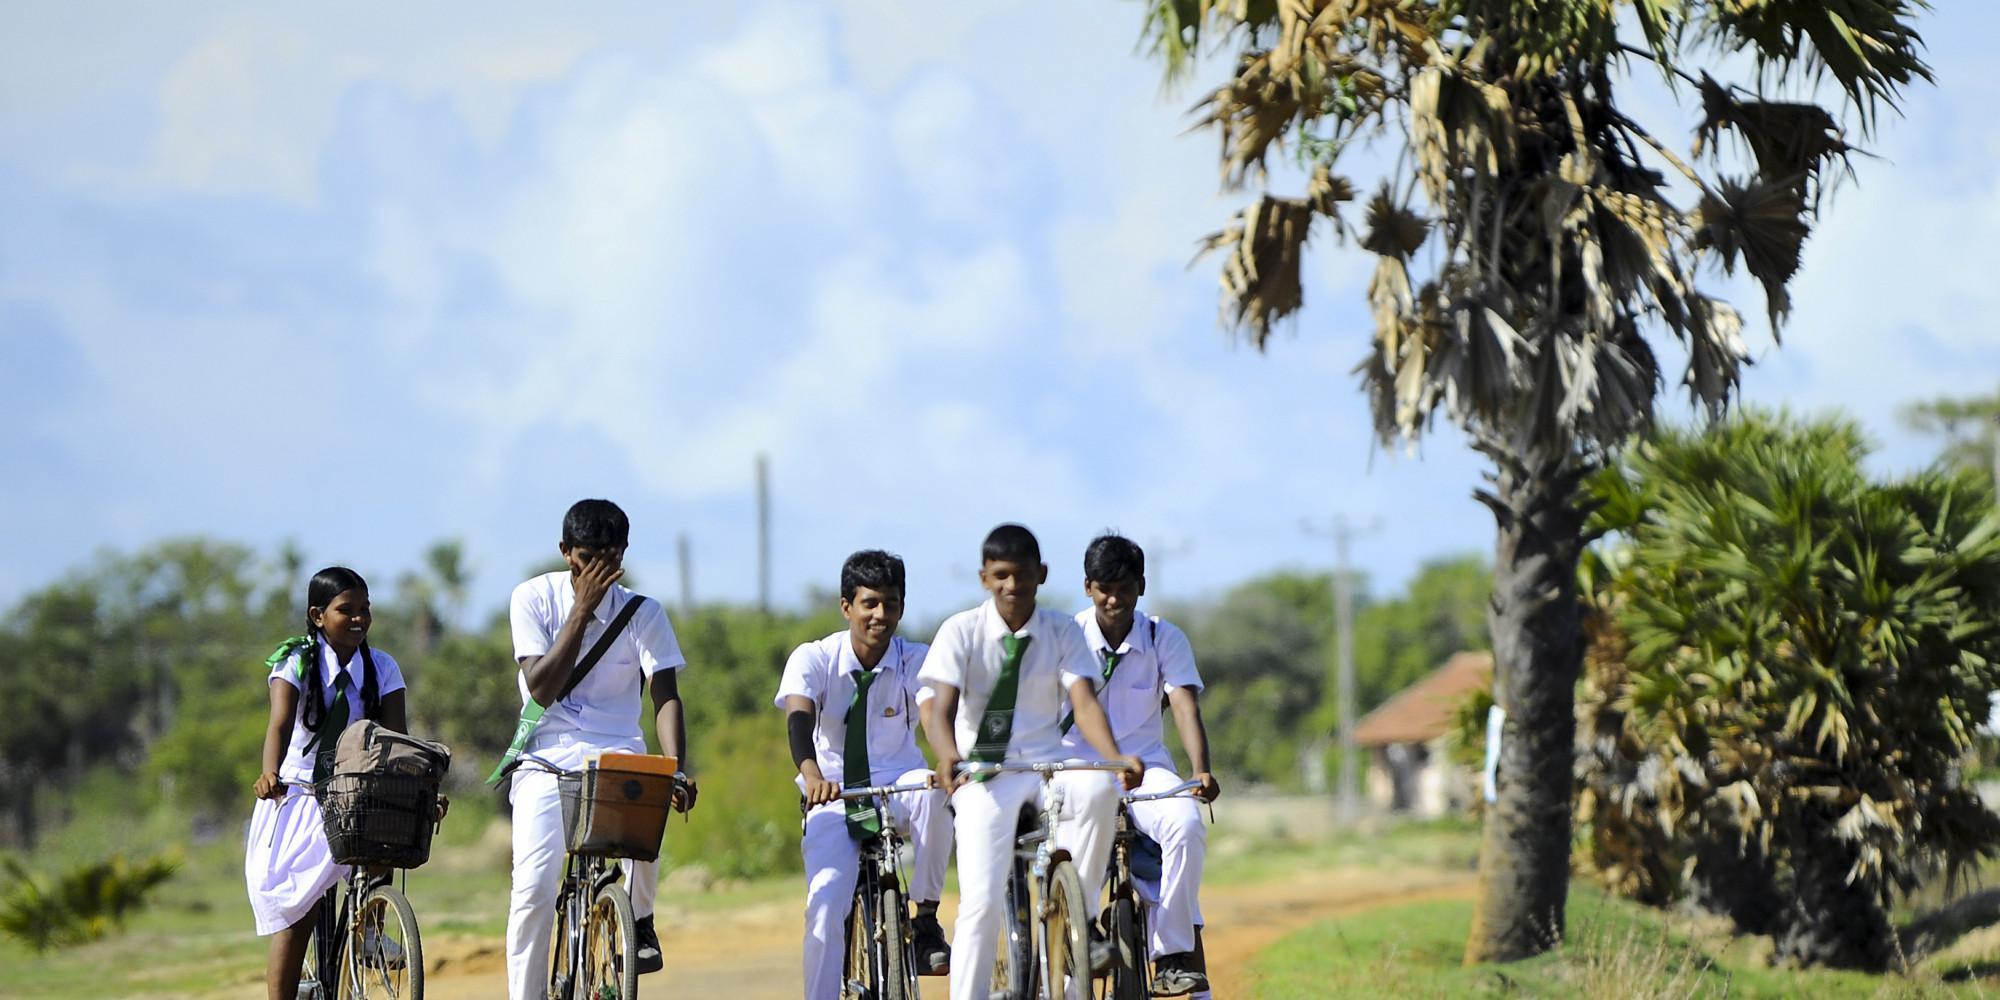 Jaffna Sri Lanka  city photos gallery : JAFFNA SRI LANKA facebook